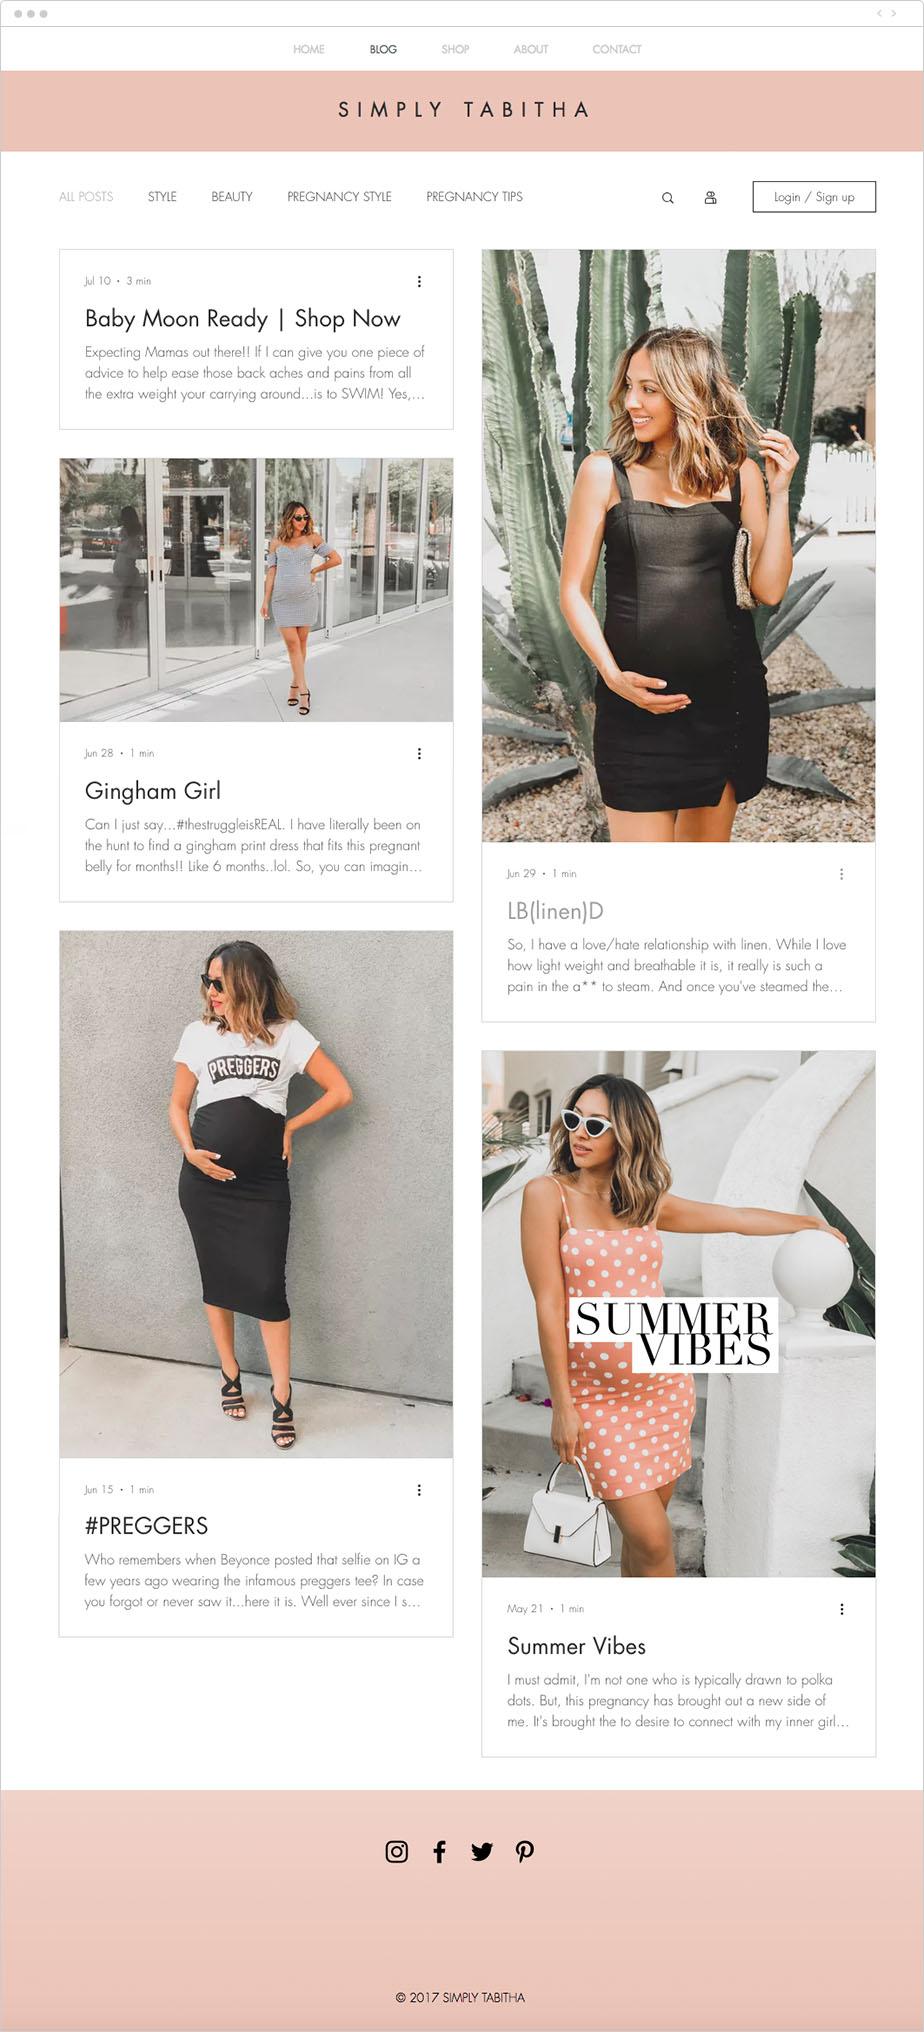 Simply Tabitha Pregnancy Blog